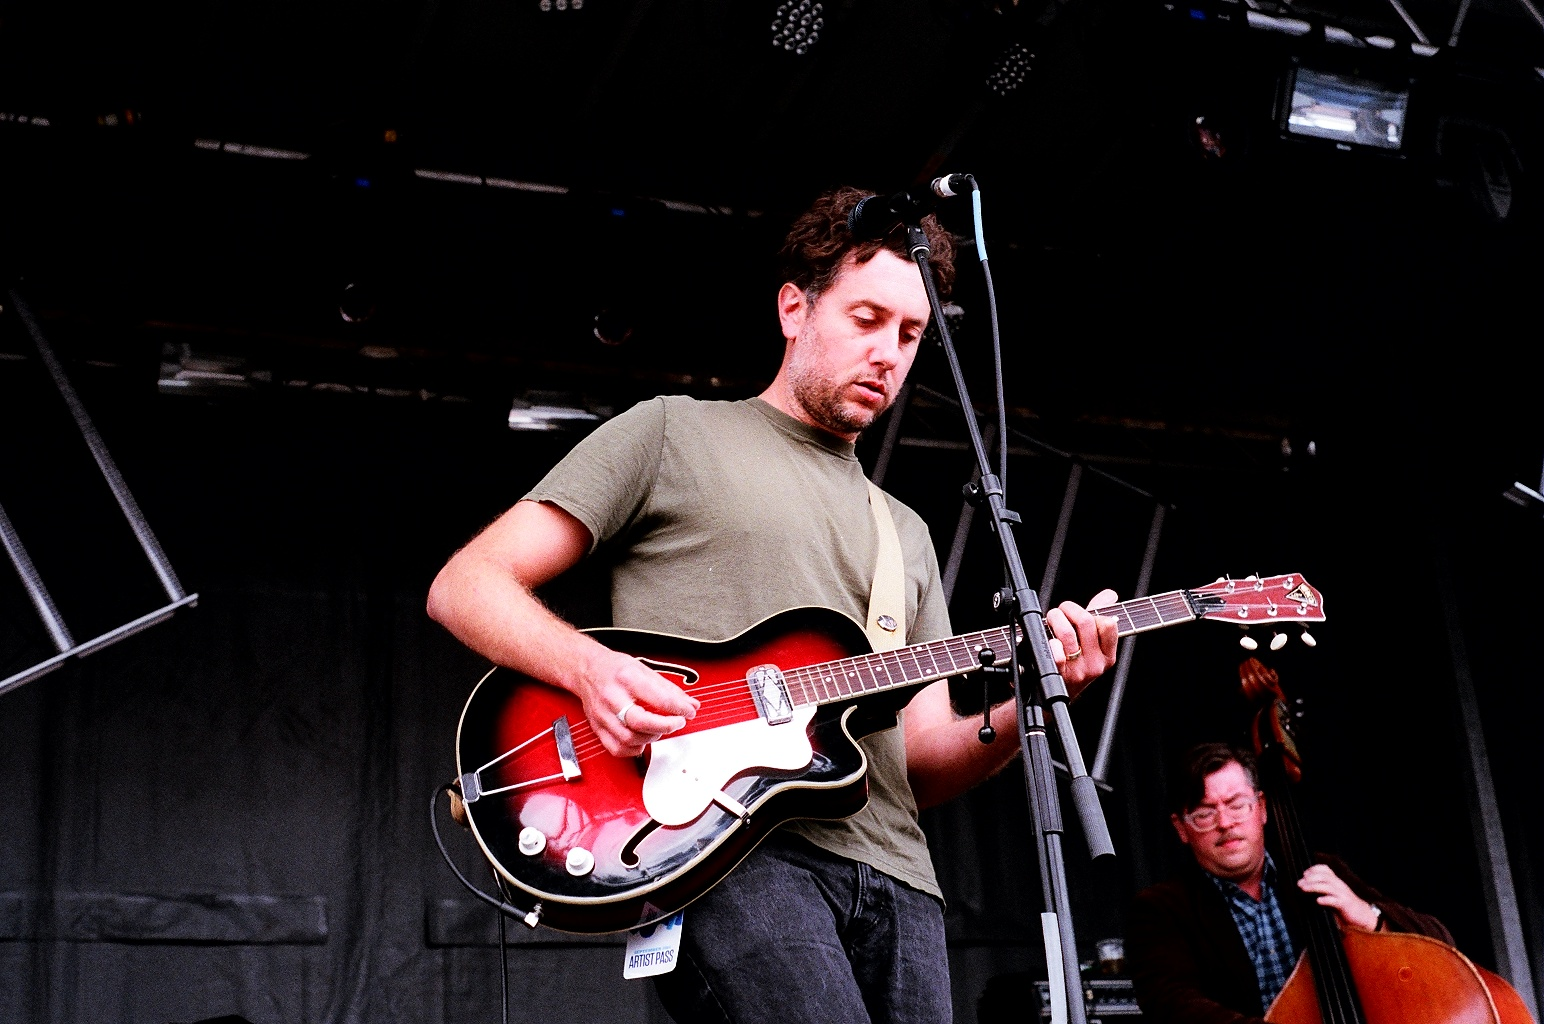 Bry Webb. Photo by Steph Dubik.